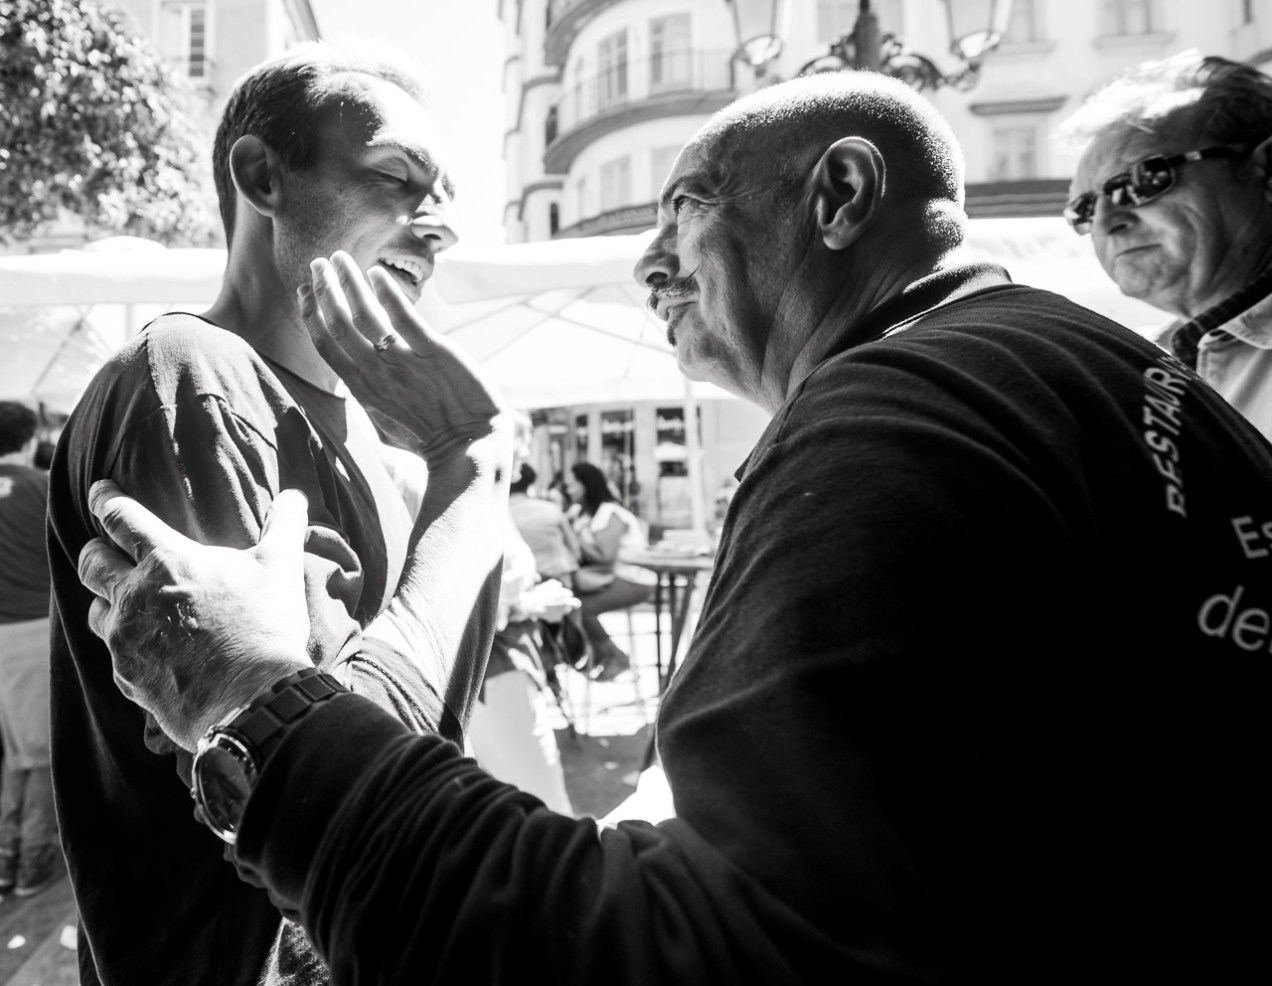 Conversation in Malaga